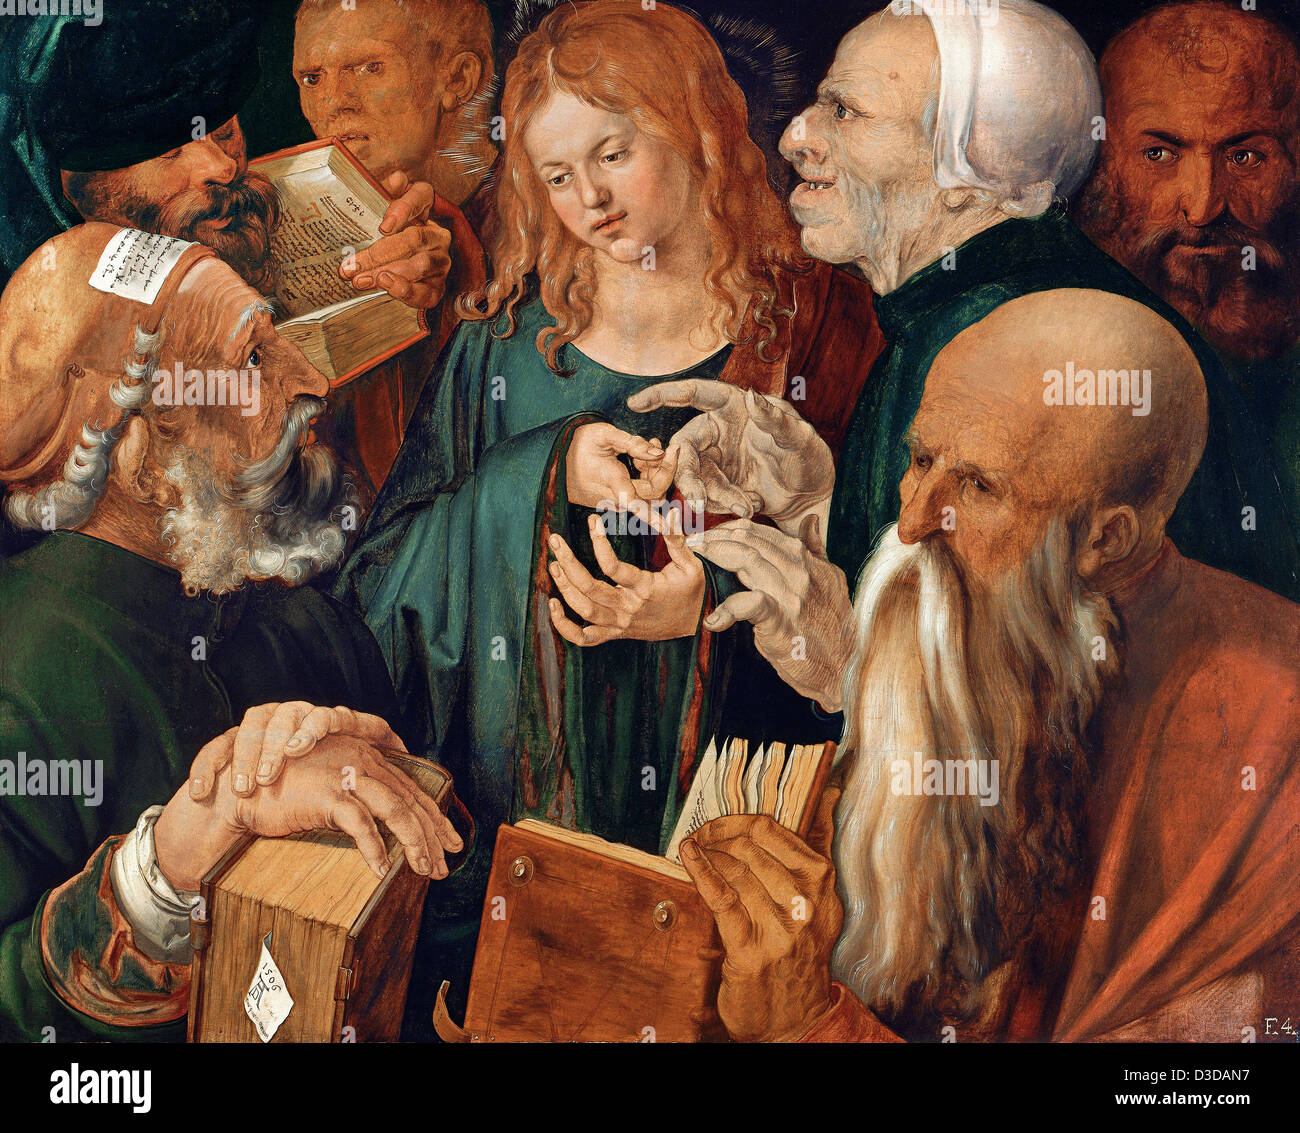 Albrecht Durer, Christ Among the Doctors 1506 Oil on panel. Thyssen-Bornemisza Museum, Madrid - Stock Image